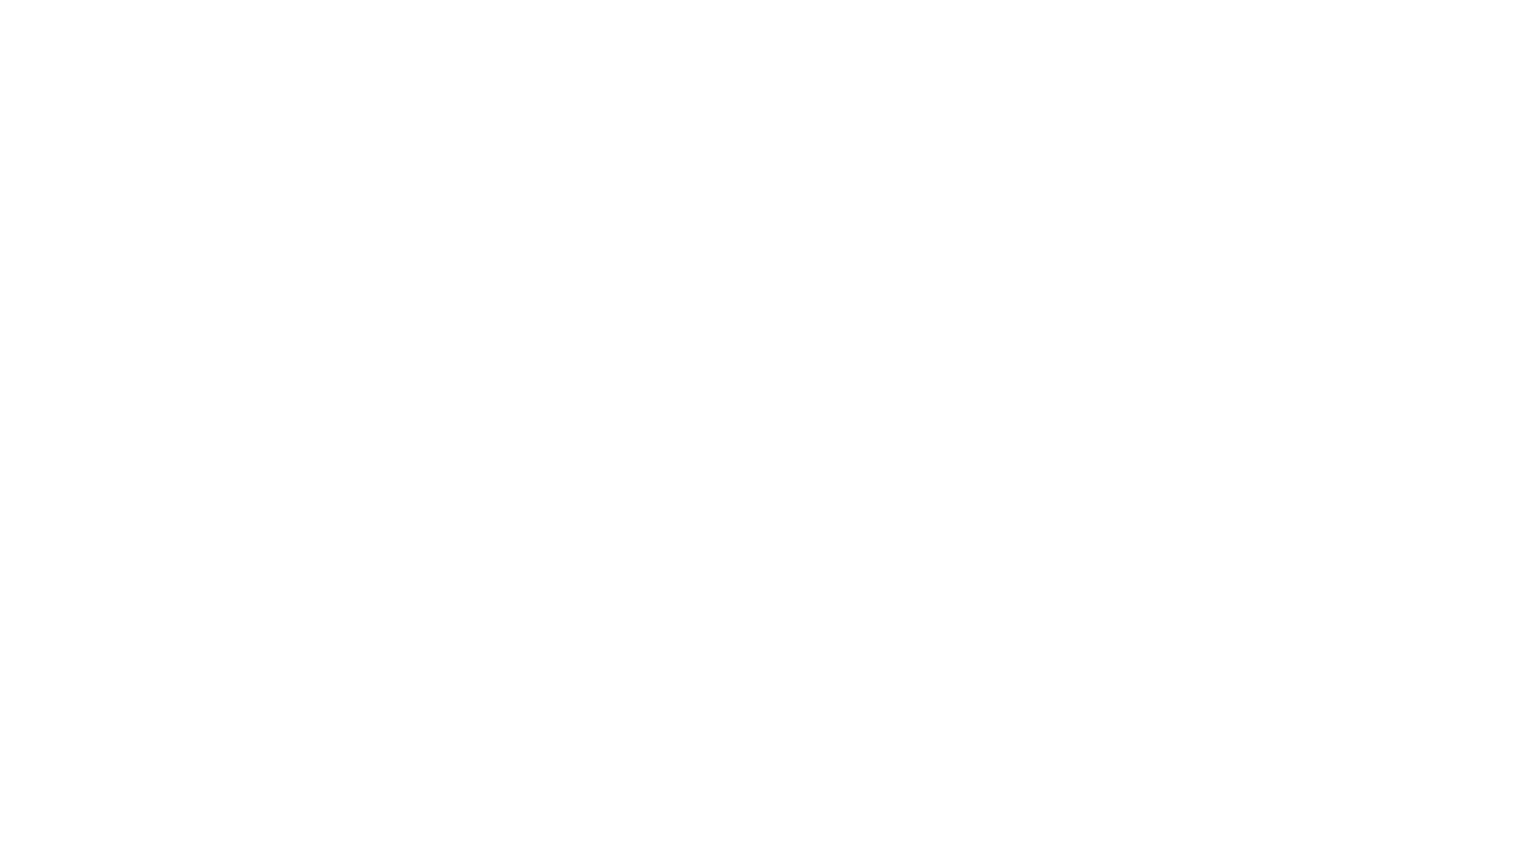 msjusticecourthelp.com